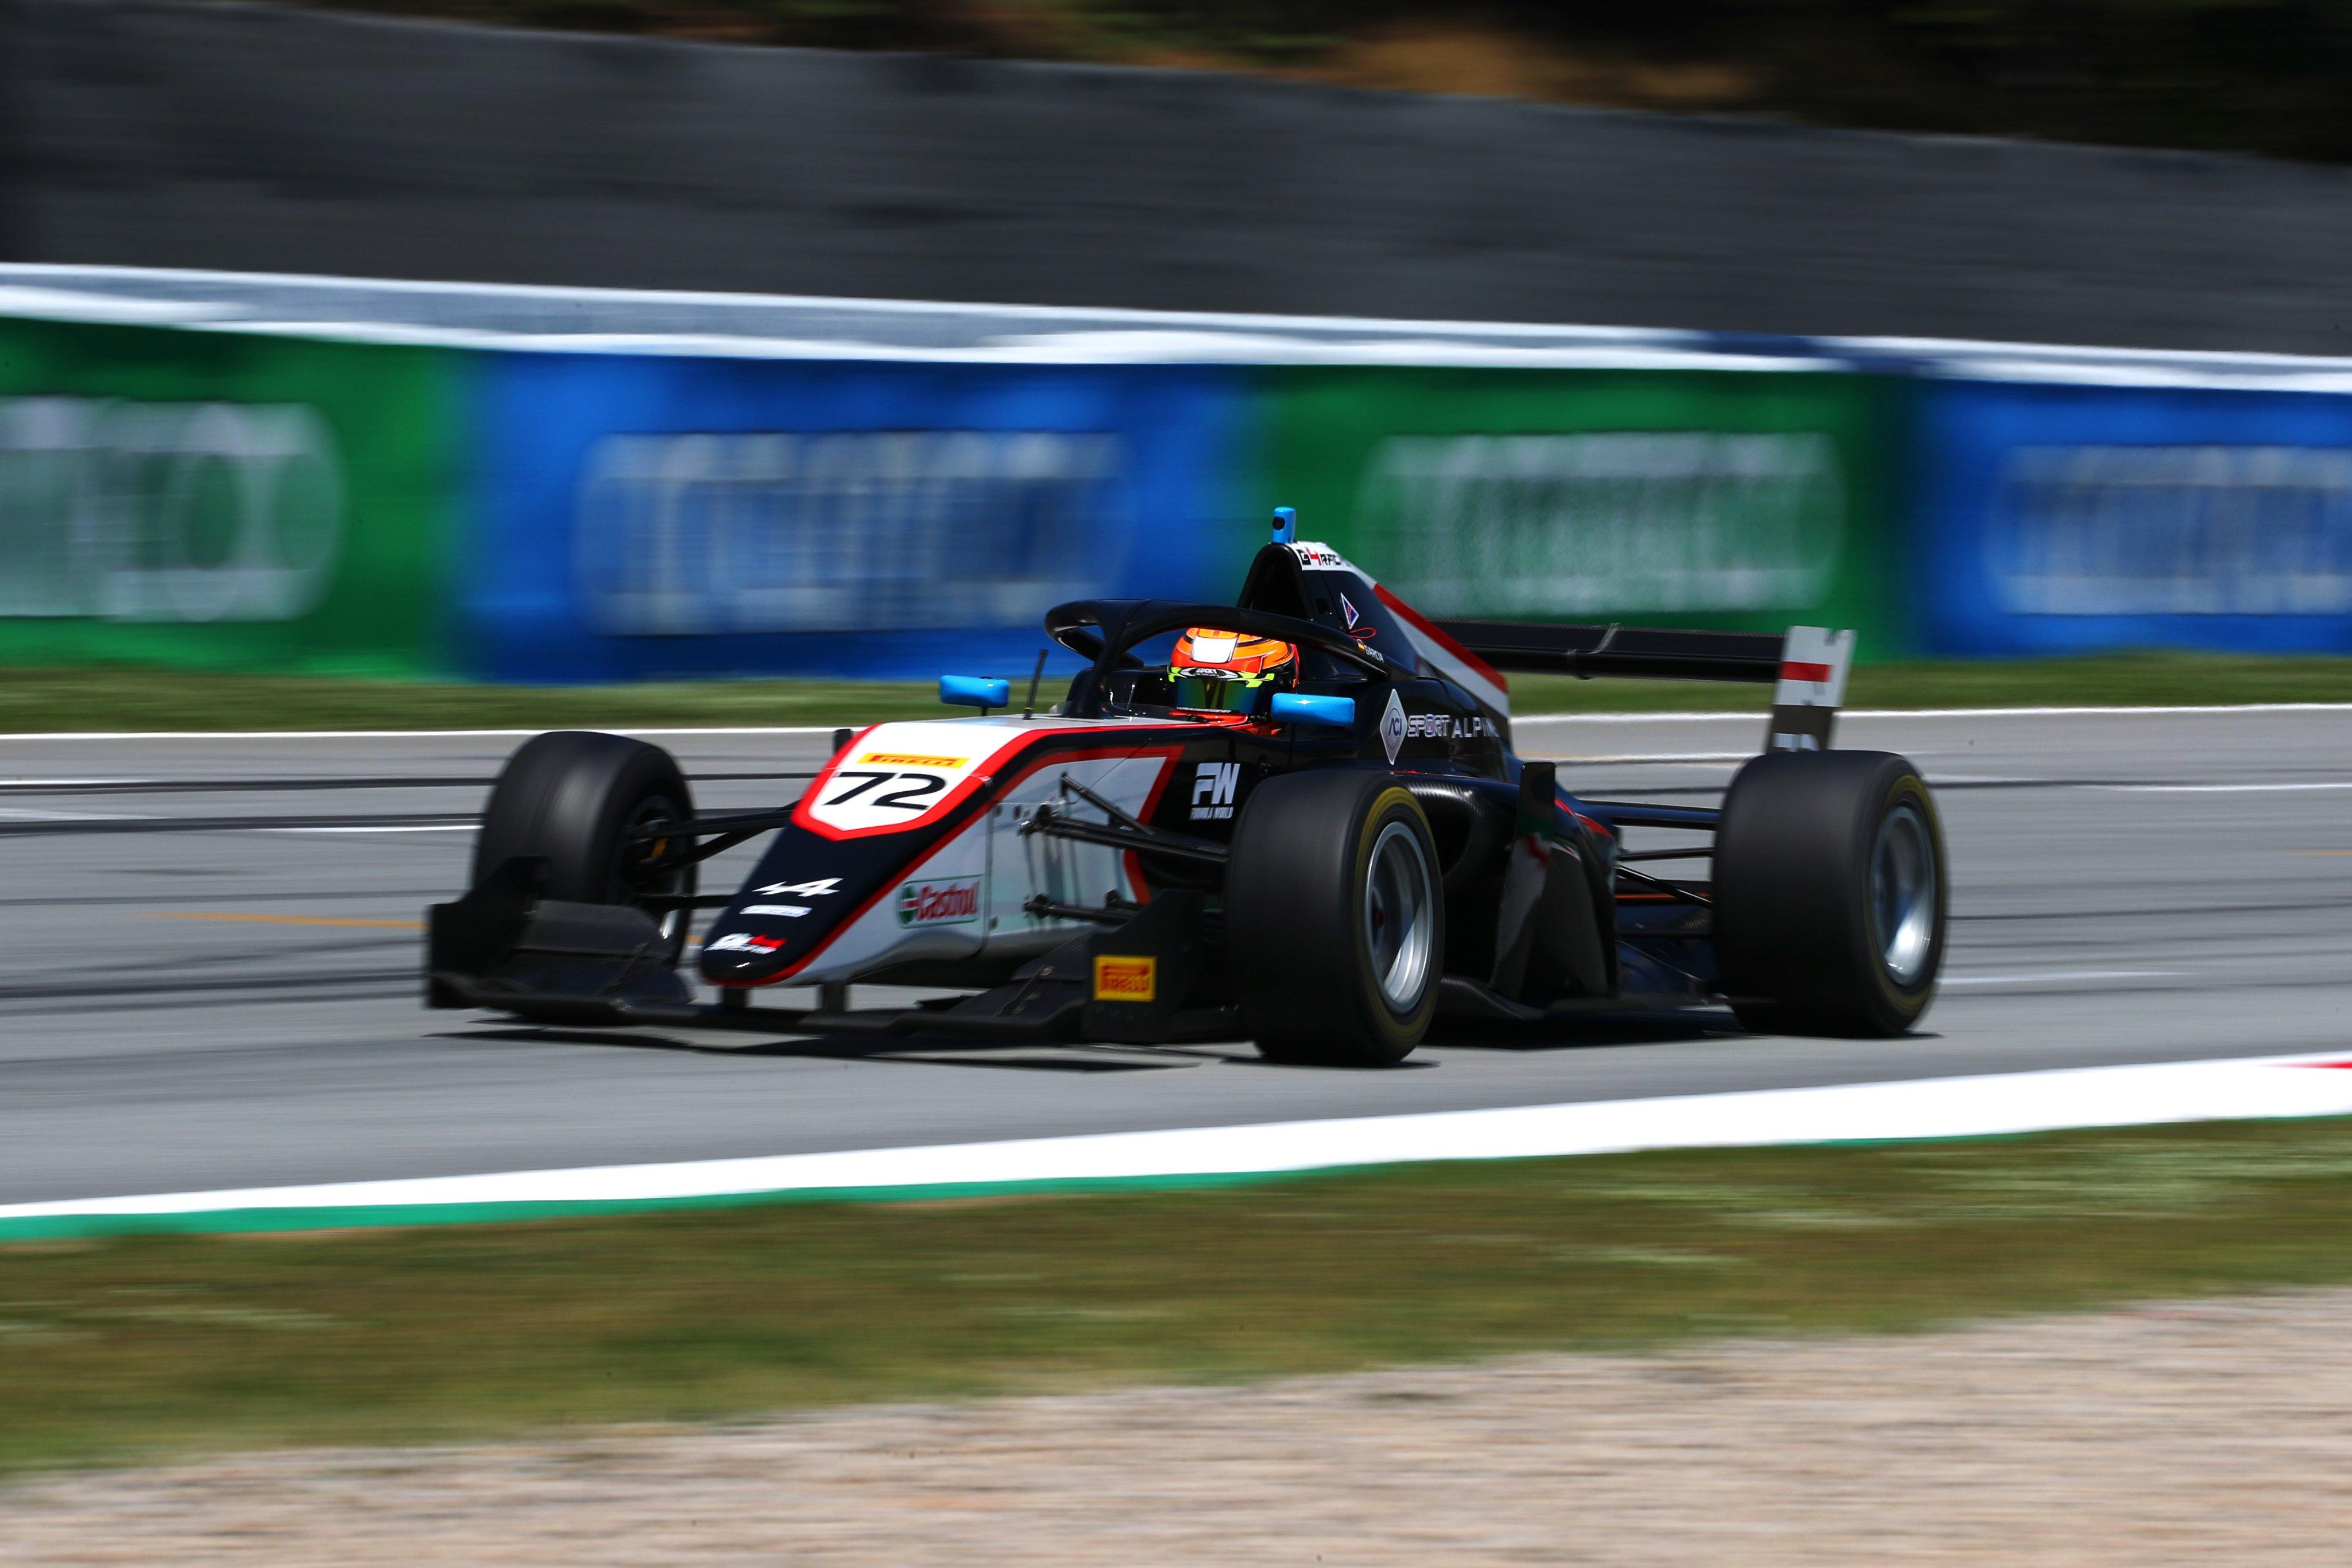 belen-garcia-formula-regional-2021-1-soymotor.jpg